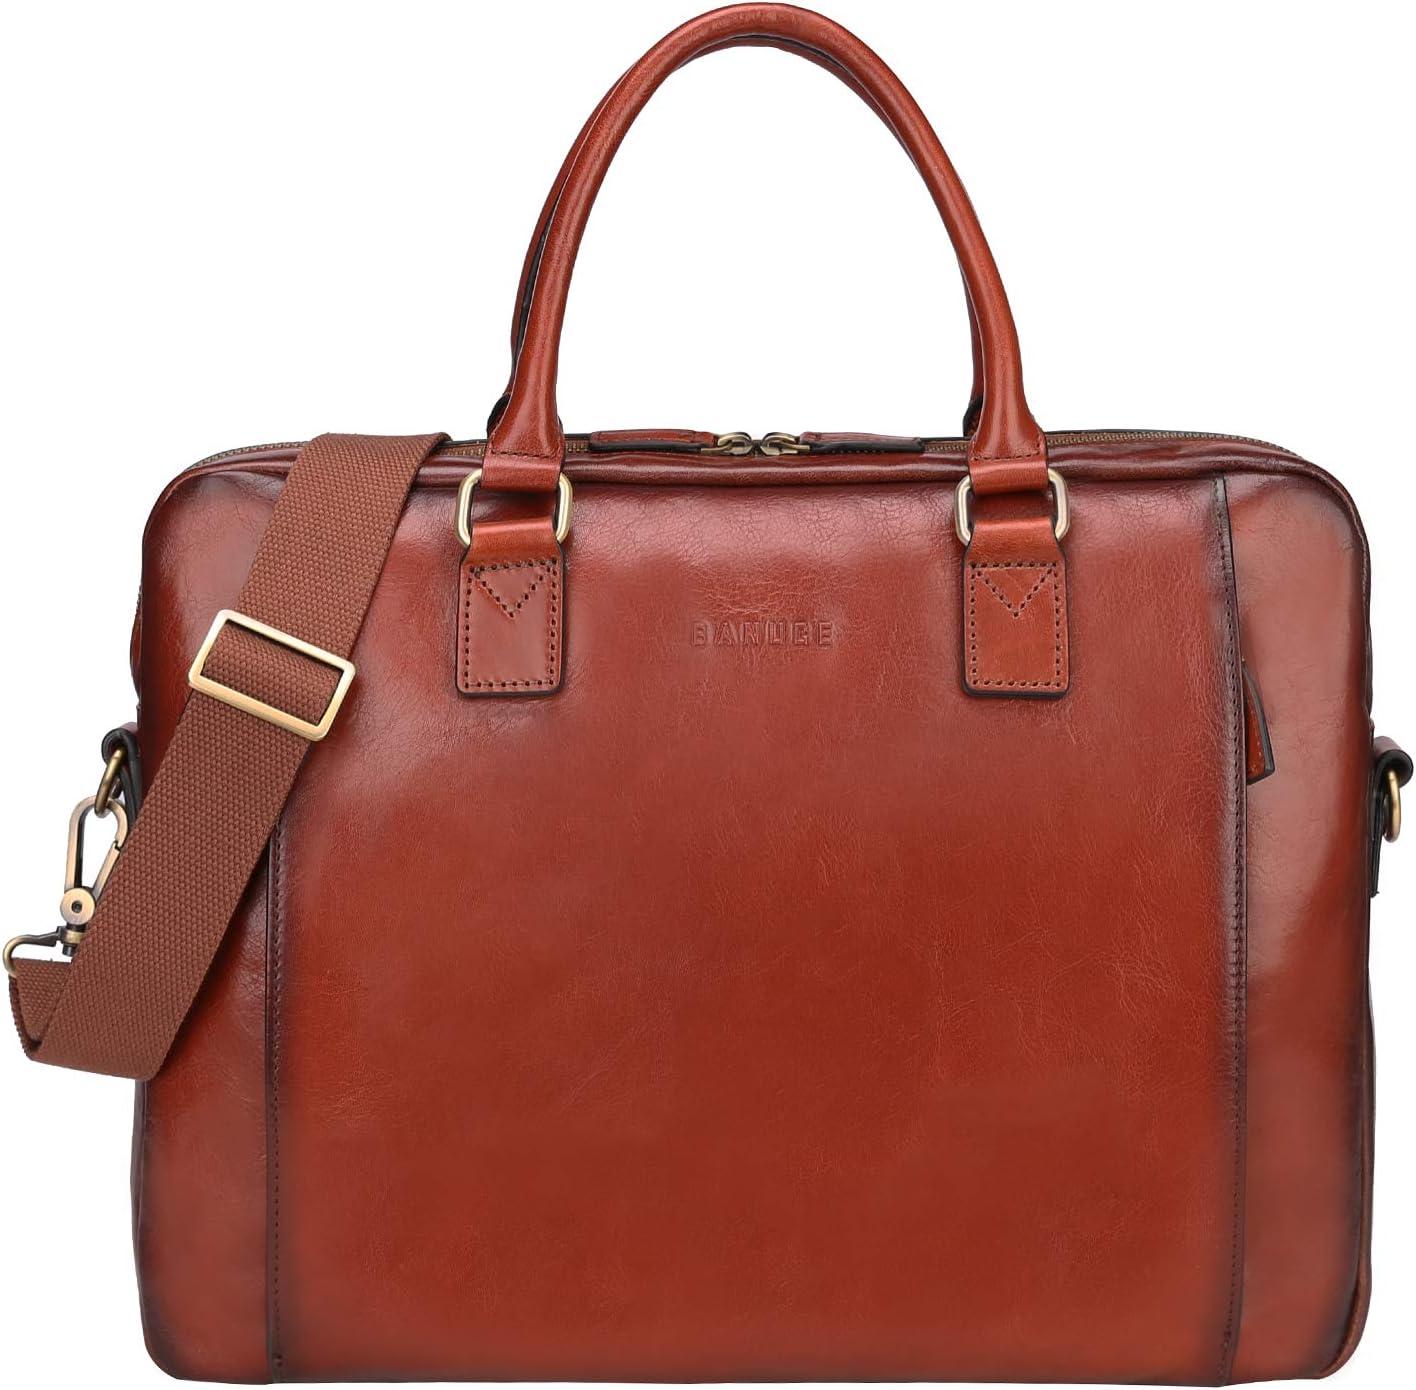 Banuce Full Grains Italian Leather Womens Briefcase 14 Laptop Bag Attache Case Ladies Handbags Tote Satchel Purse Messenger Business Bags